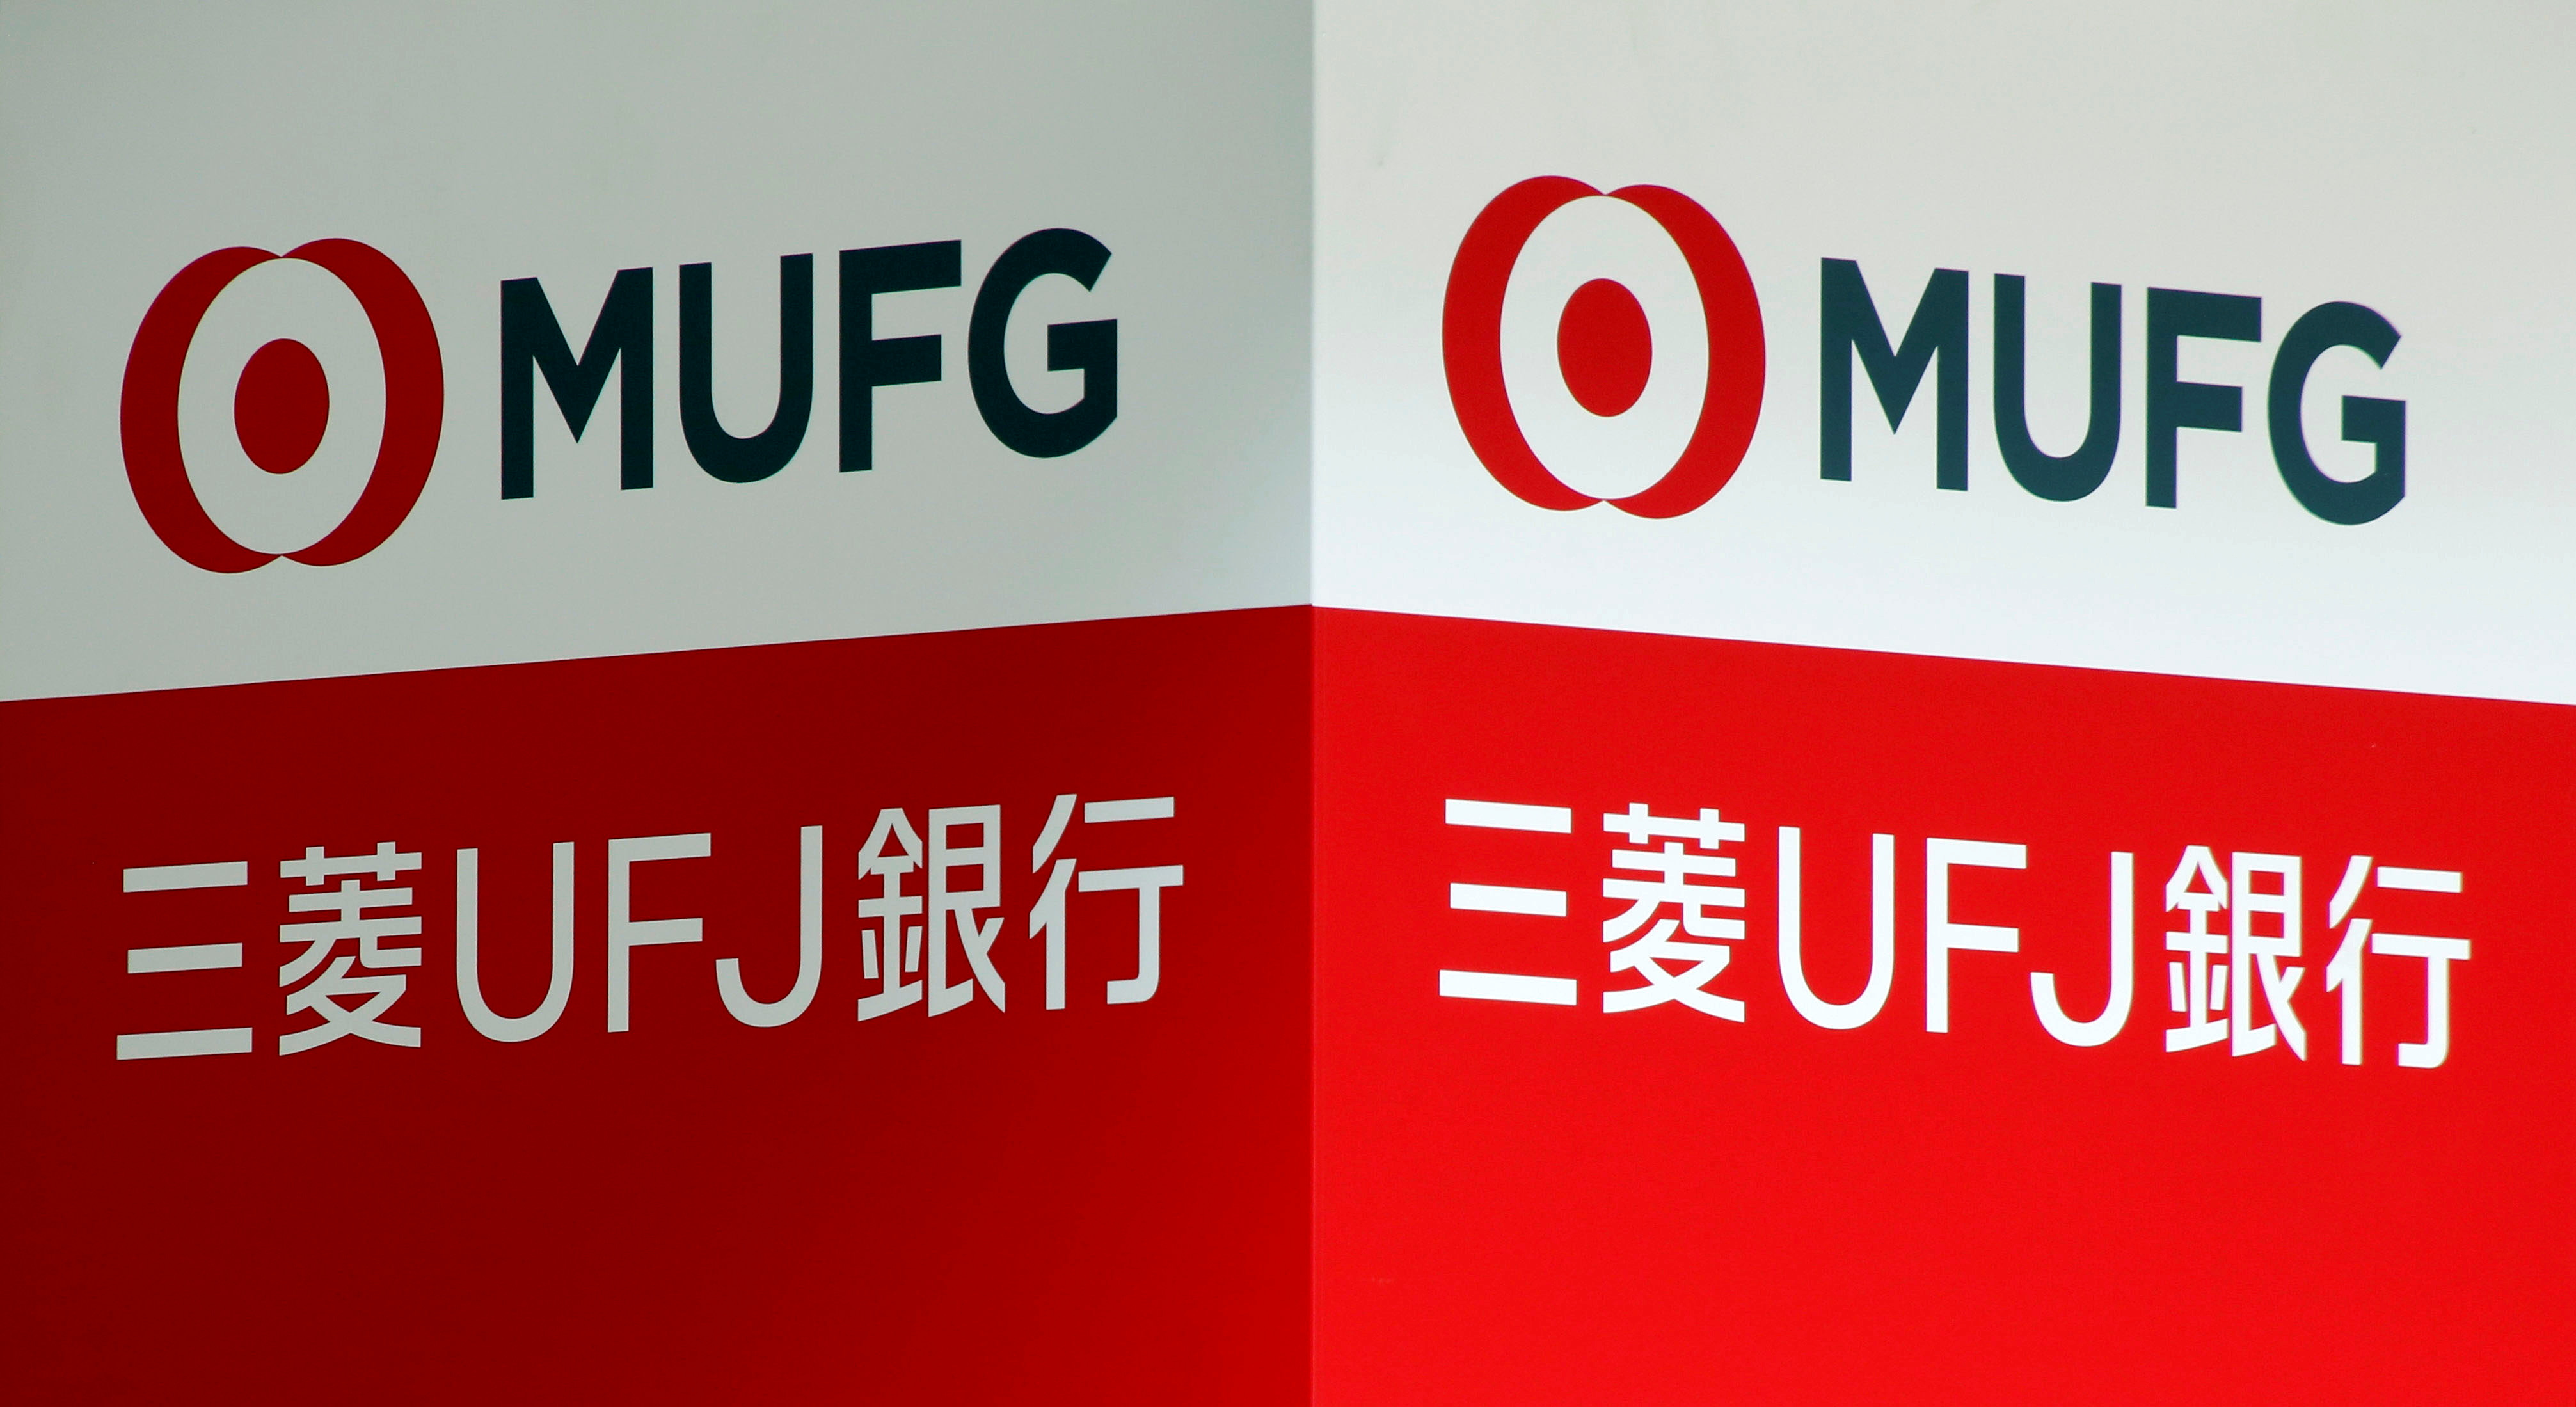 A signboard of MUFG Bank is seen in Tokyo, Japan April 3, 2018. REUTERS/Toru Hanai